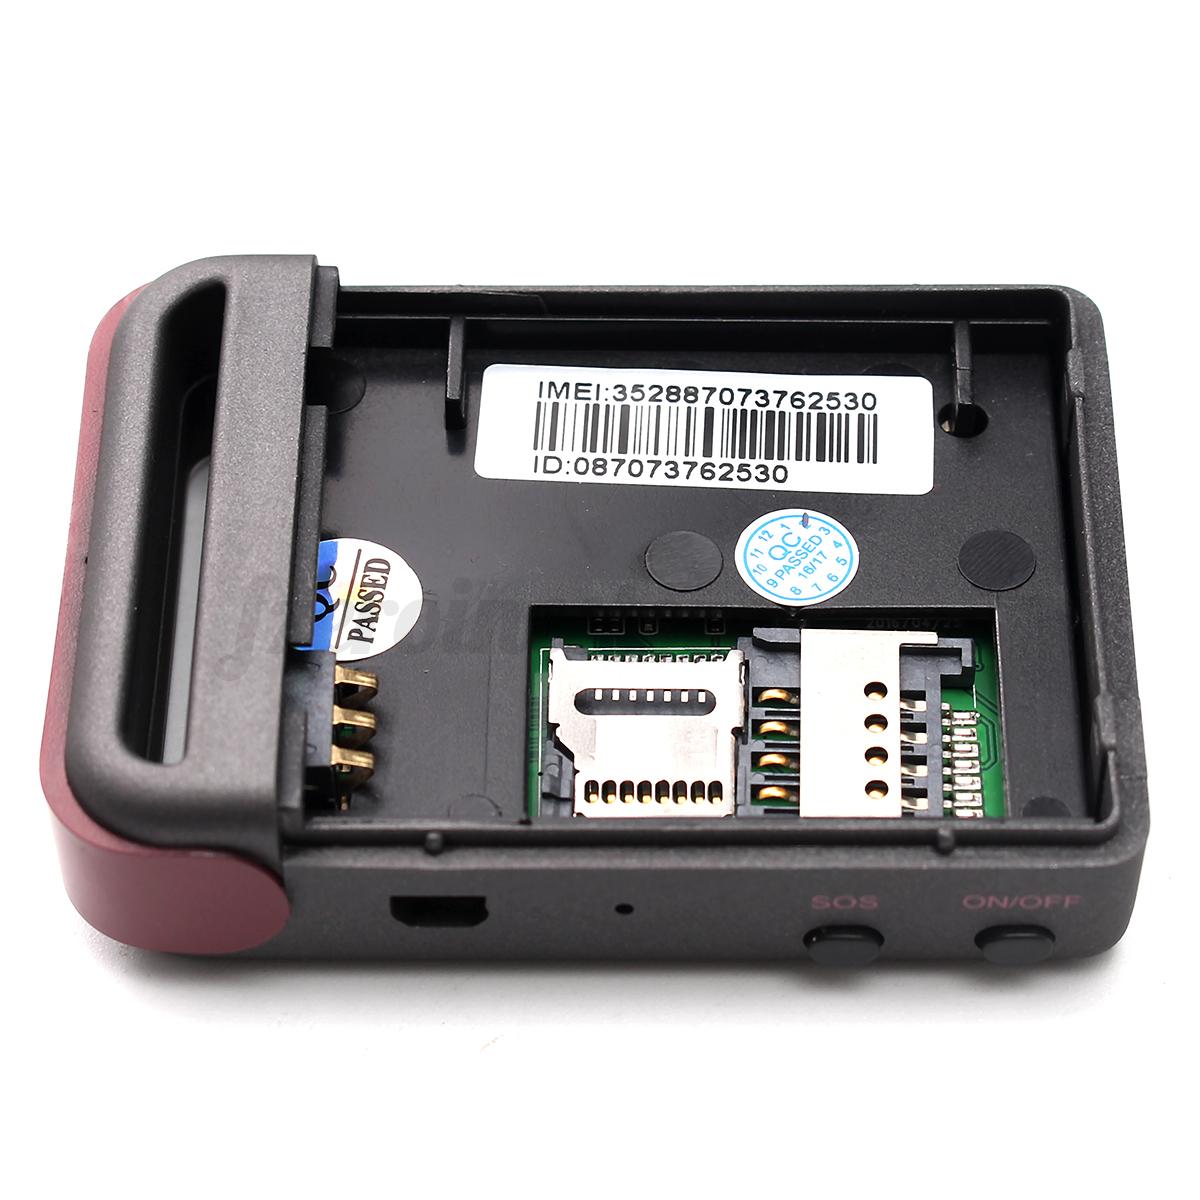 mini localizzatore tk102b satellitare gprs gps gsm manual gps tracker 102 b español gps tracker tk102-2 manual